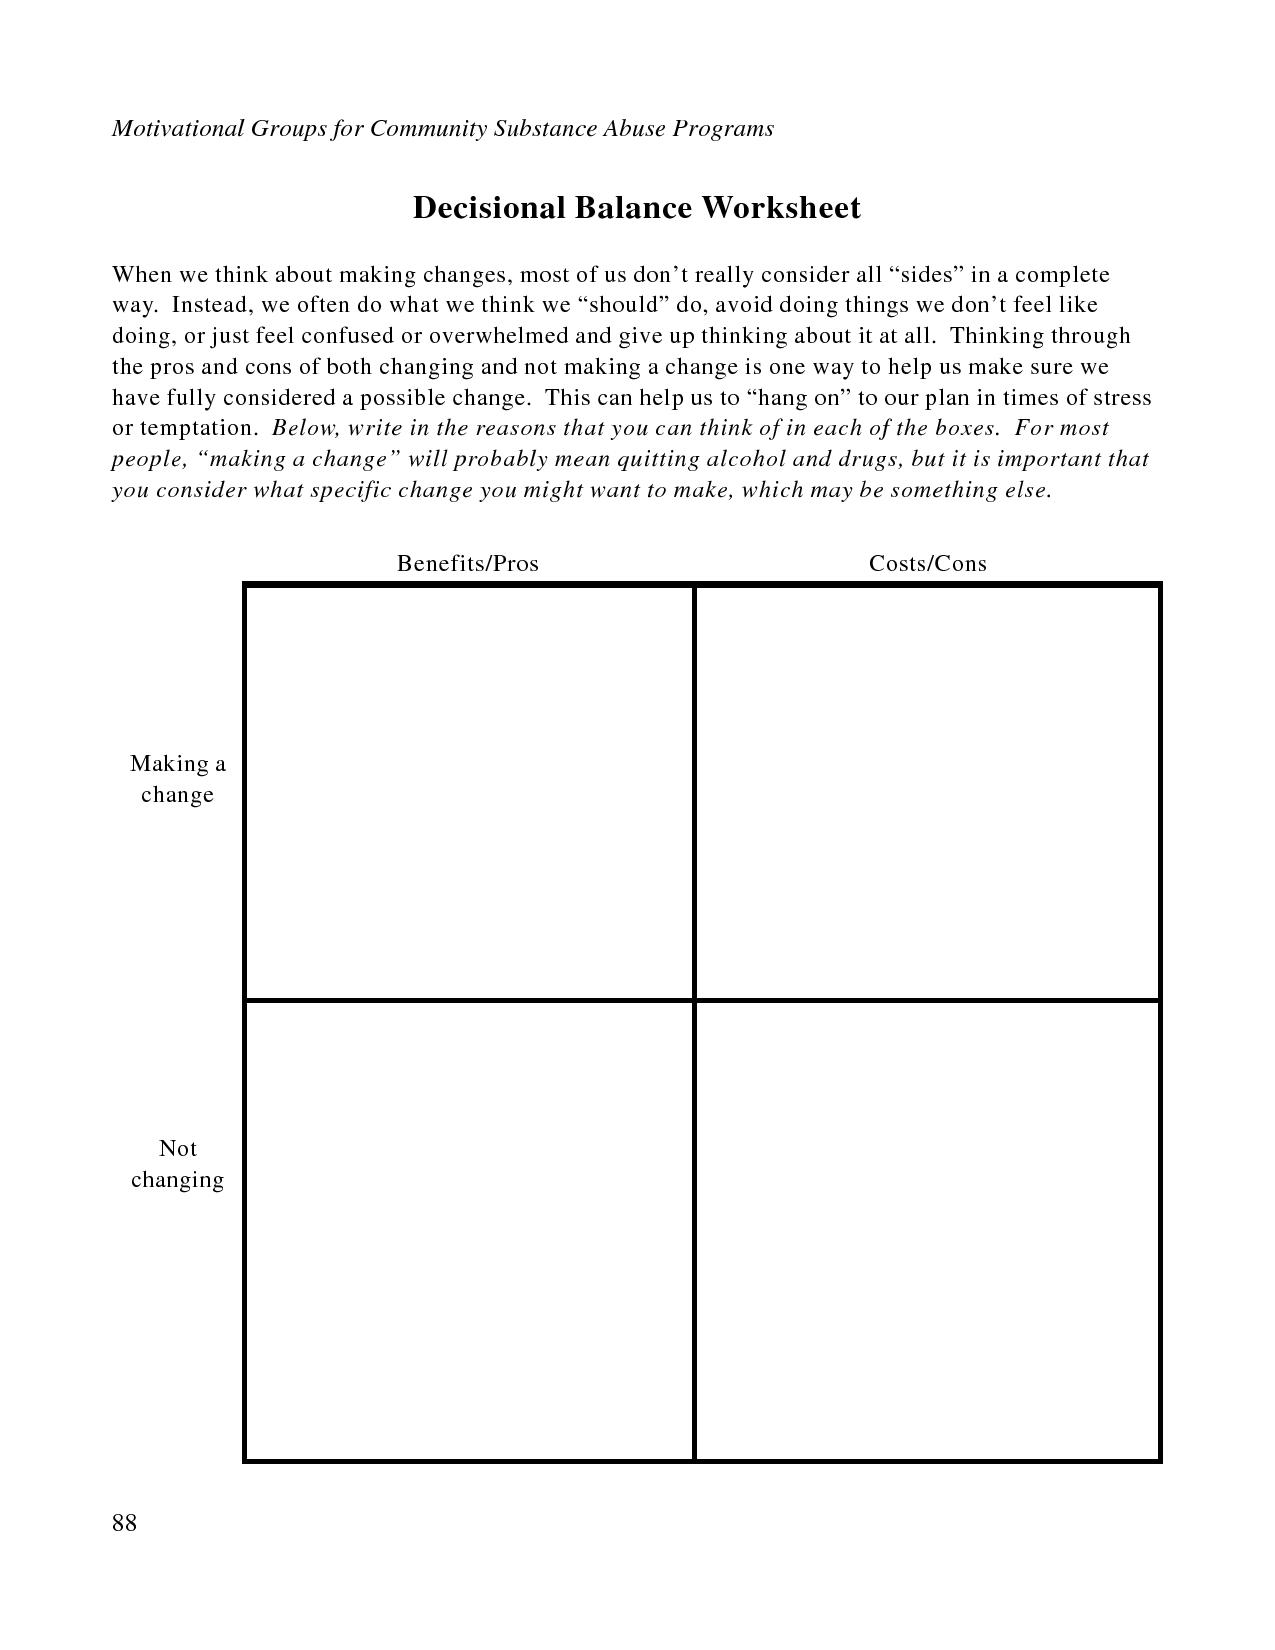 Free Printable Dbt Worksheets   Decisional Balance Worksheet - Pdf - Free Printable Counseling Worksheets